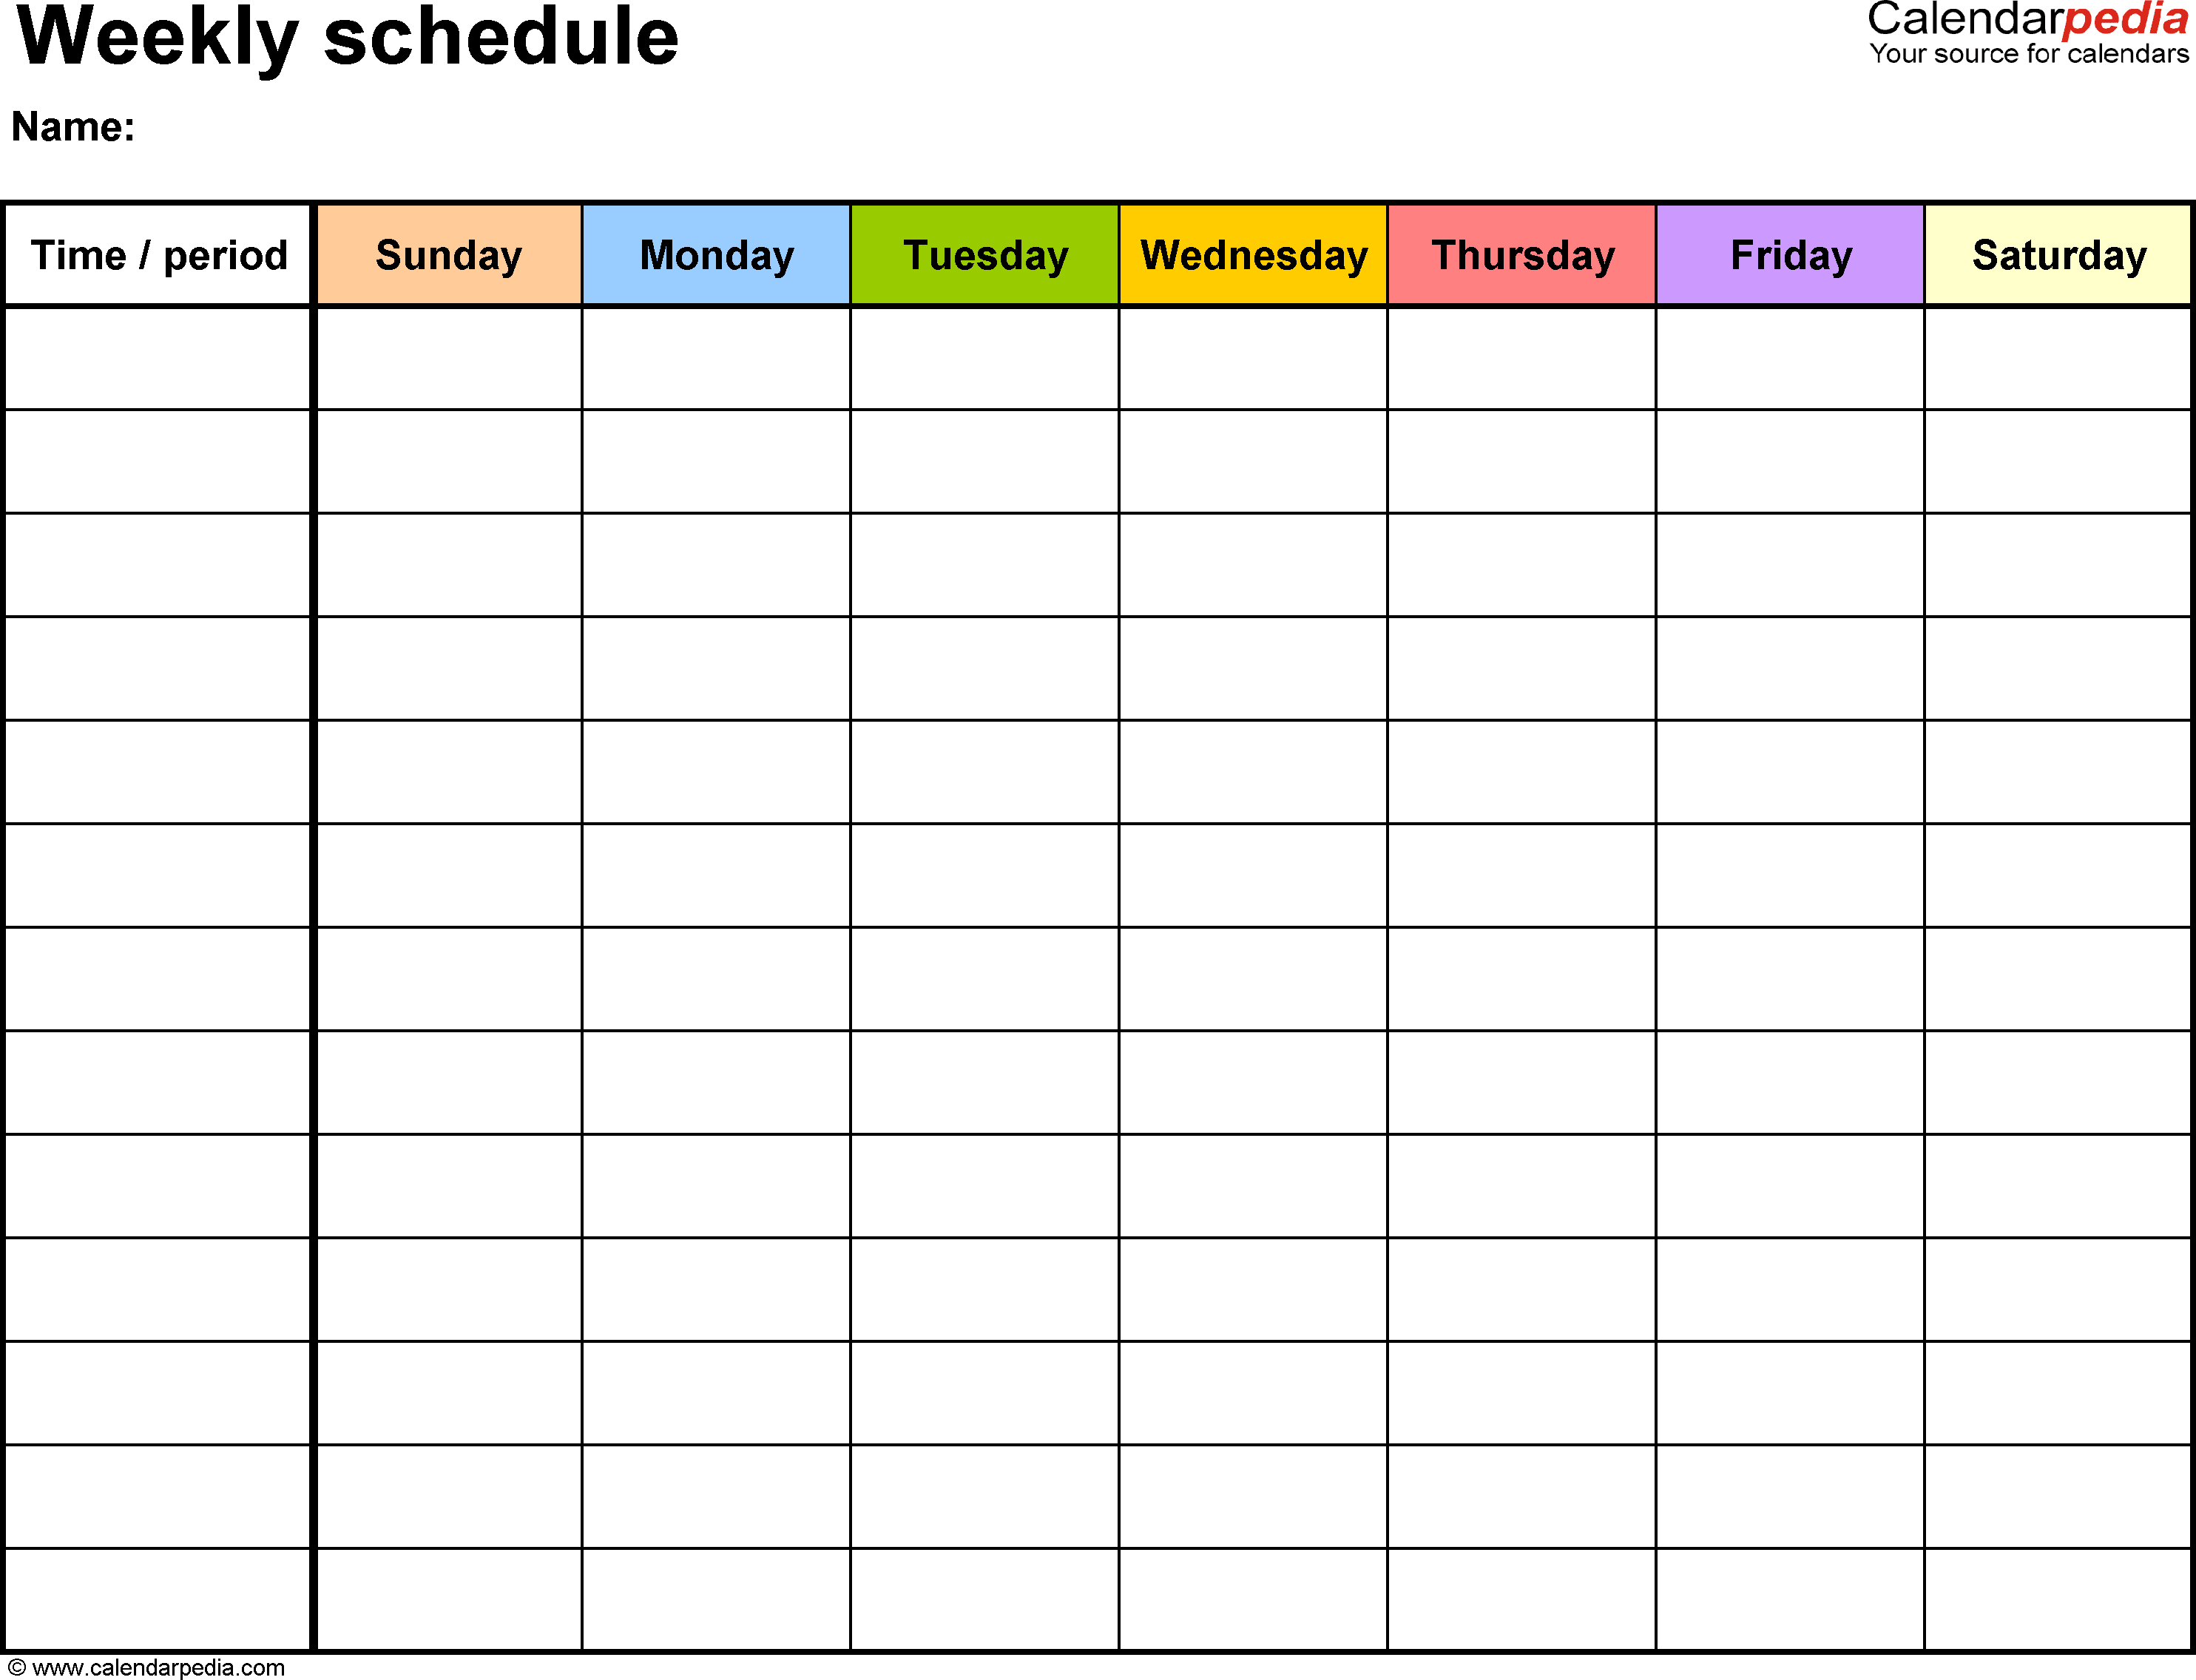 Weekly Schedule Template For Word Version 13: Landscape, 1 2 Week Schedule Word Template